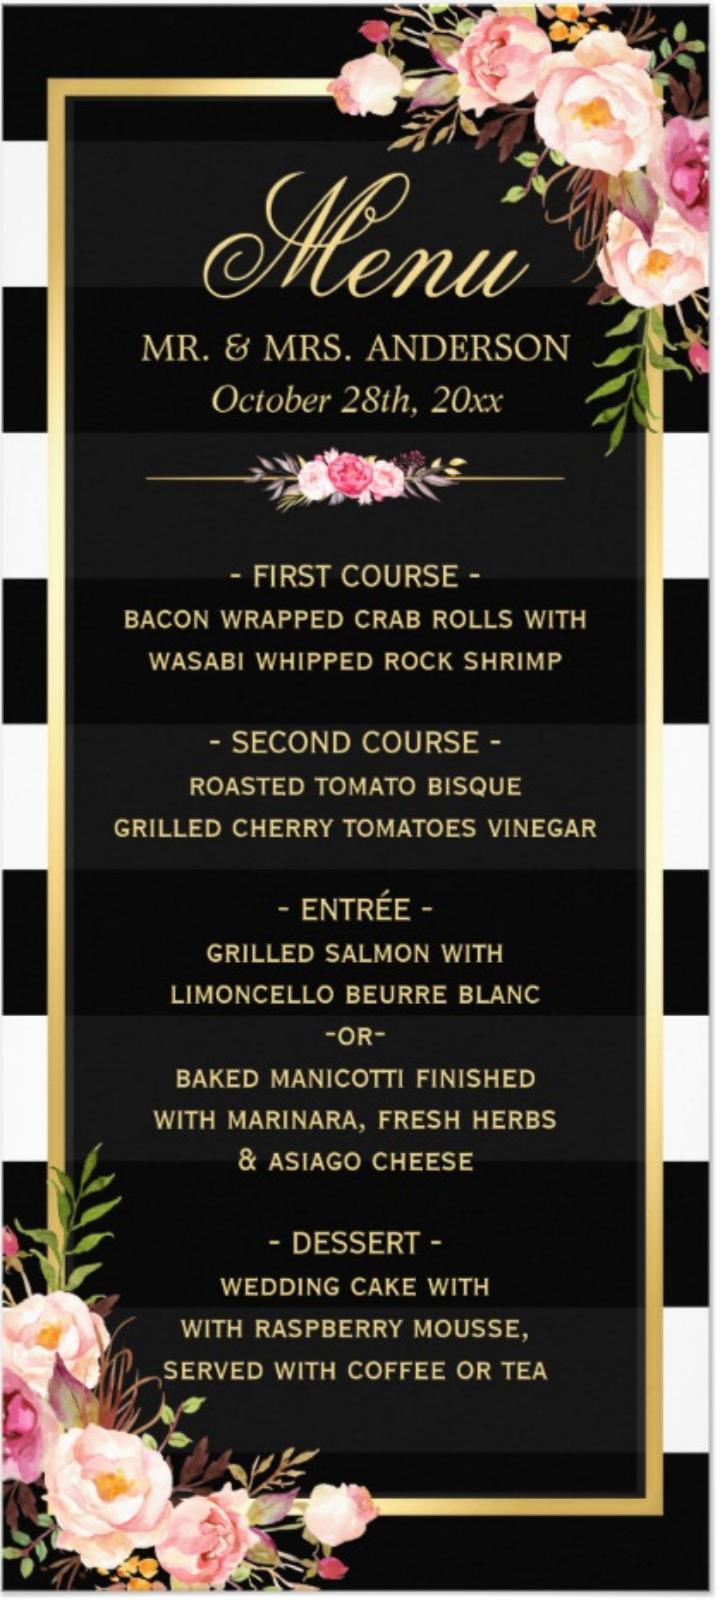 black and white floral menu design